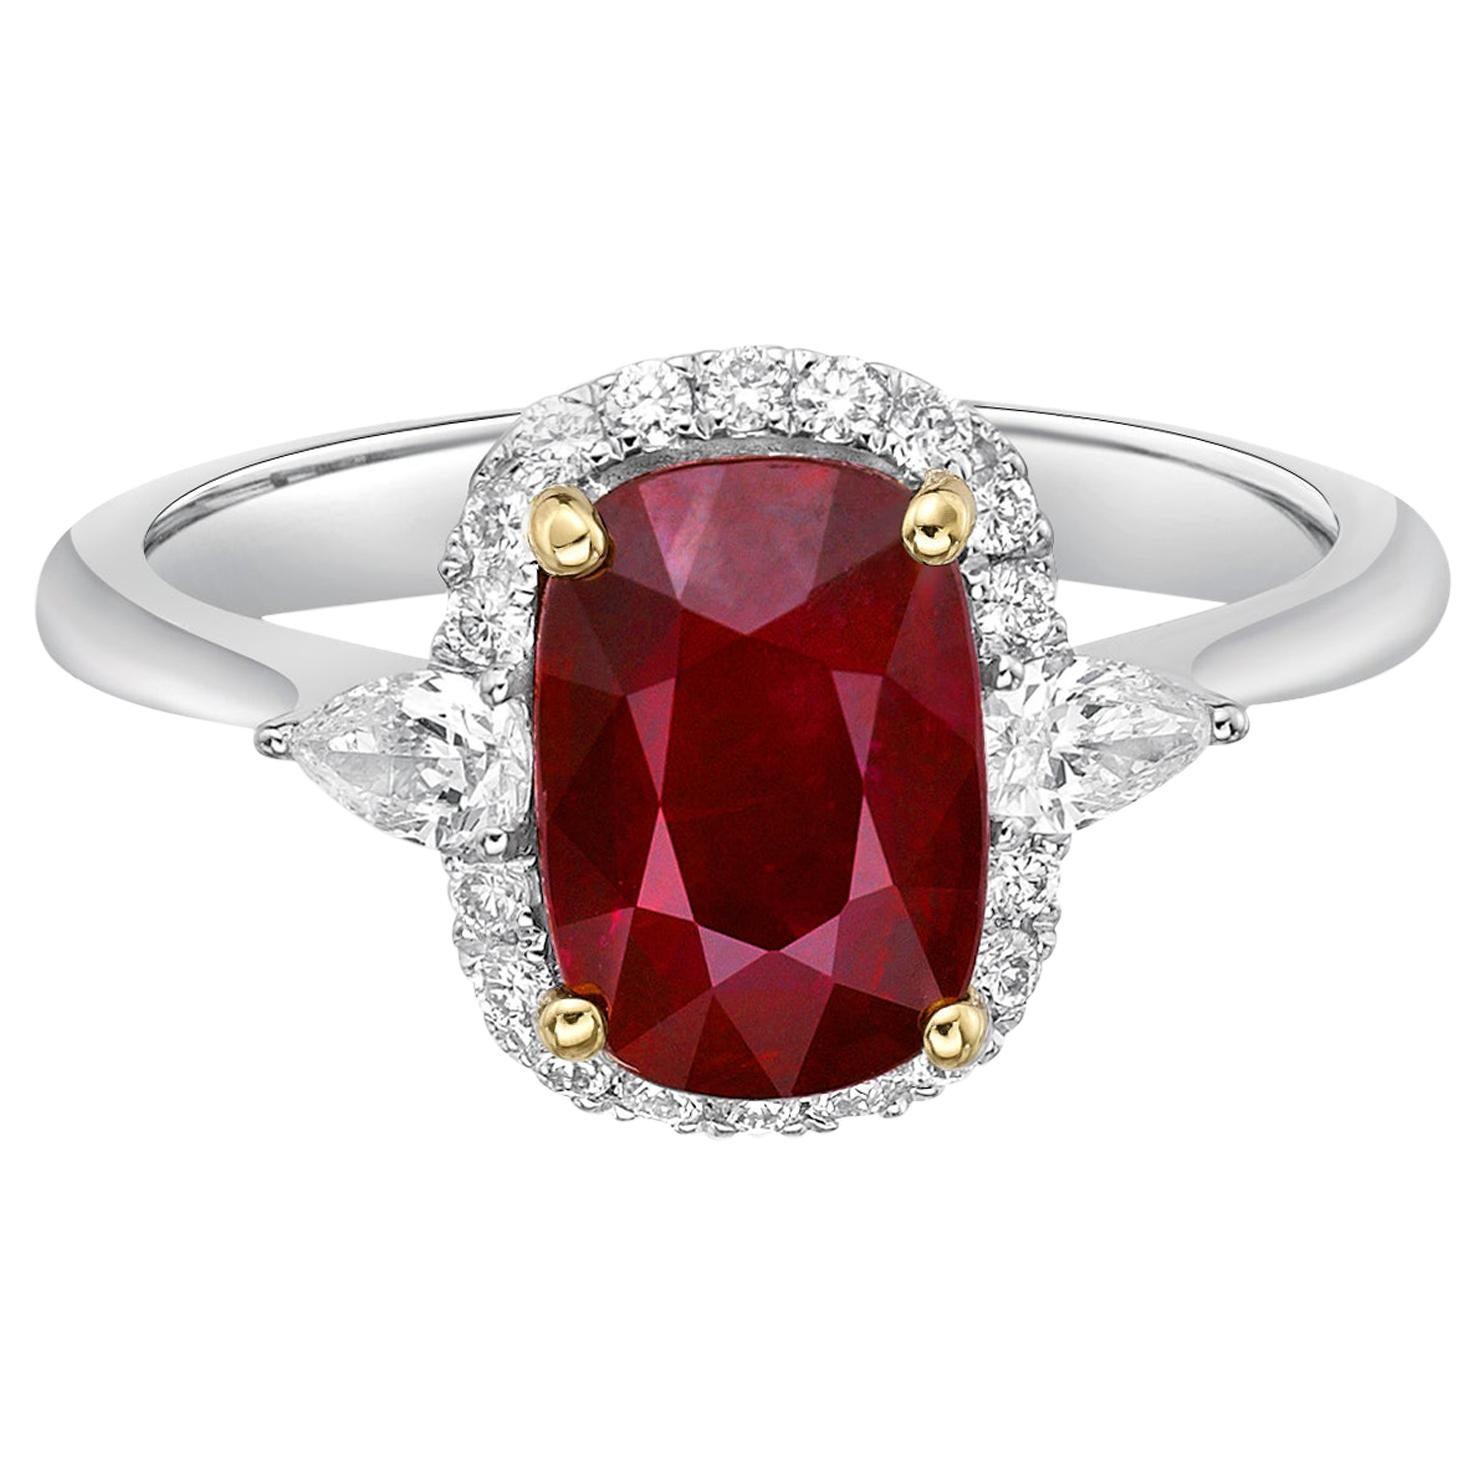 2.17 Carat Vivid Red Ruby GRS Certified Unheated Diamond Ring Cushion Cut